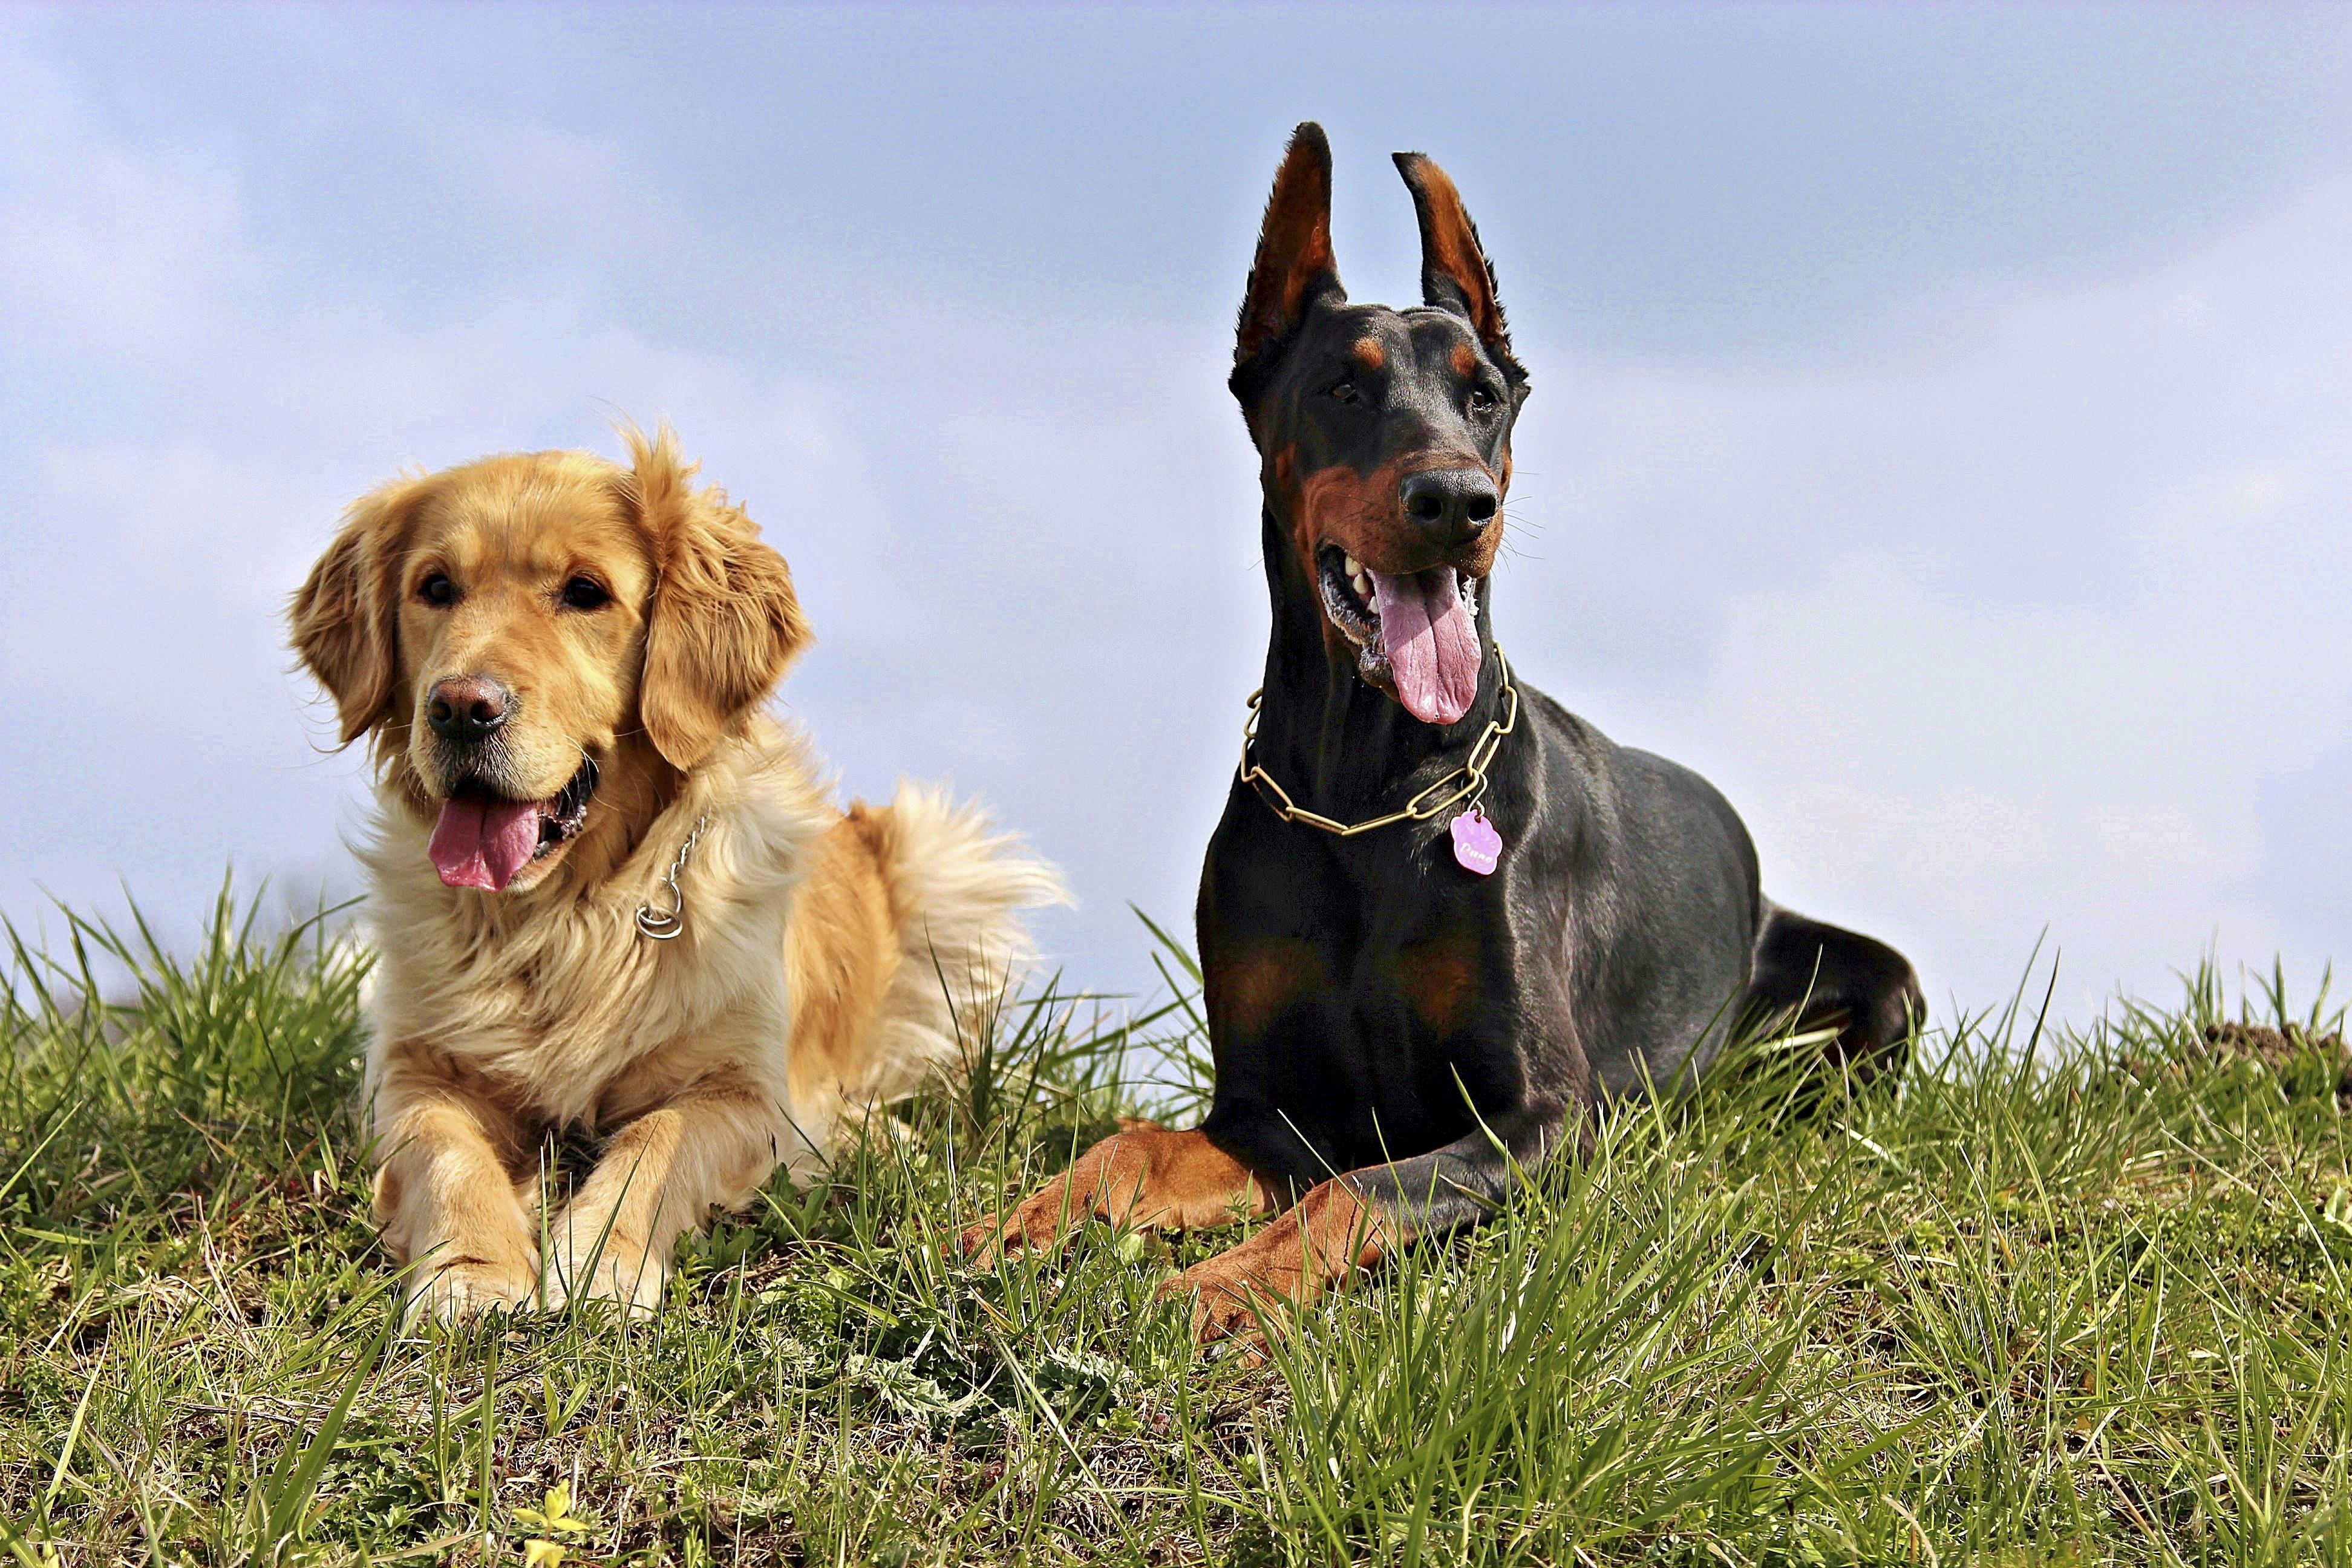 Free Images : Dogs, Vertebrate, Dog Breed, Doberman, Dog